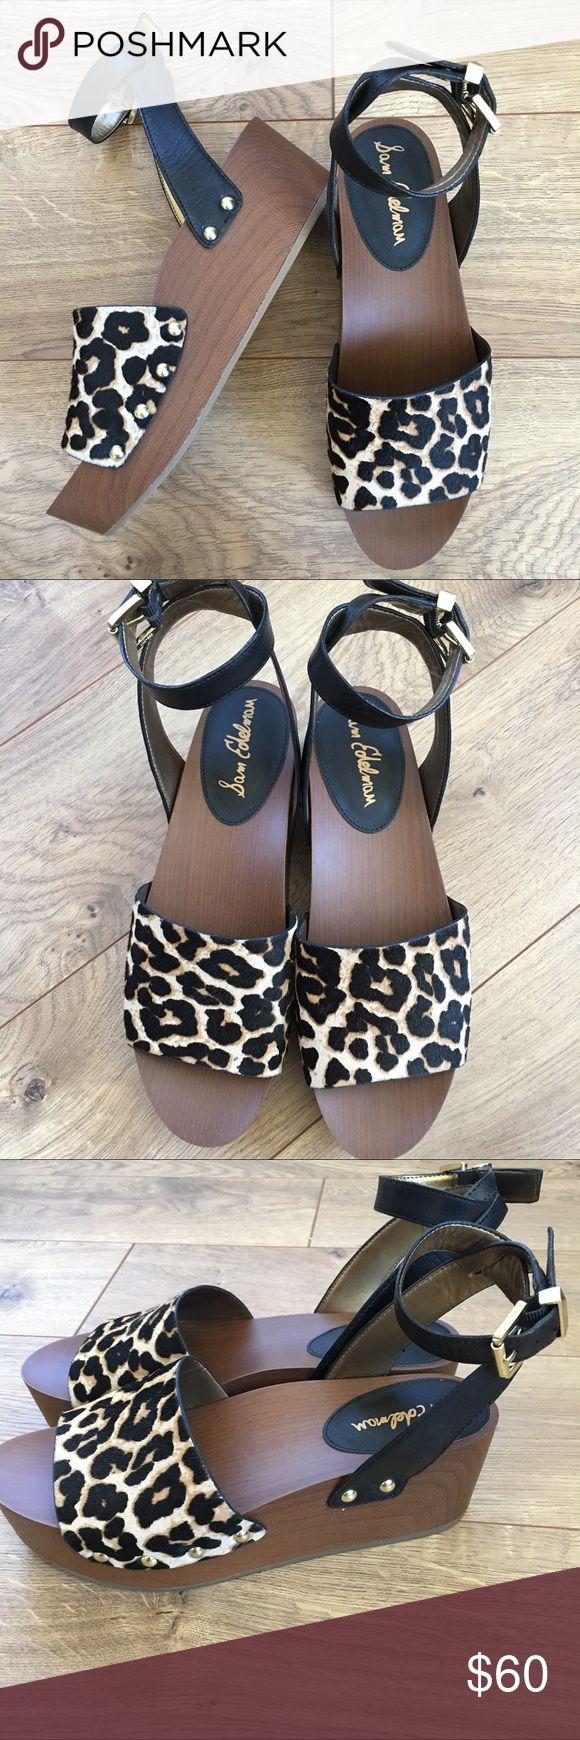 NIB SAM EDELMAN Brynn Leopard Wedge Sandal - 8.5 New in box. SAM EDELMAN Brynn Leopard Wedge Sandal - 8.5. Adjustable ankle strap. Gold colored hardware. Smoke free home. Sam Edelman Shoes Platforms